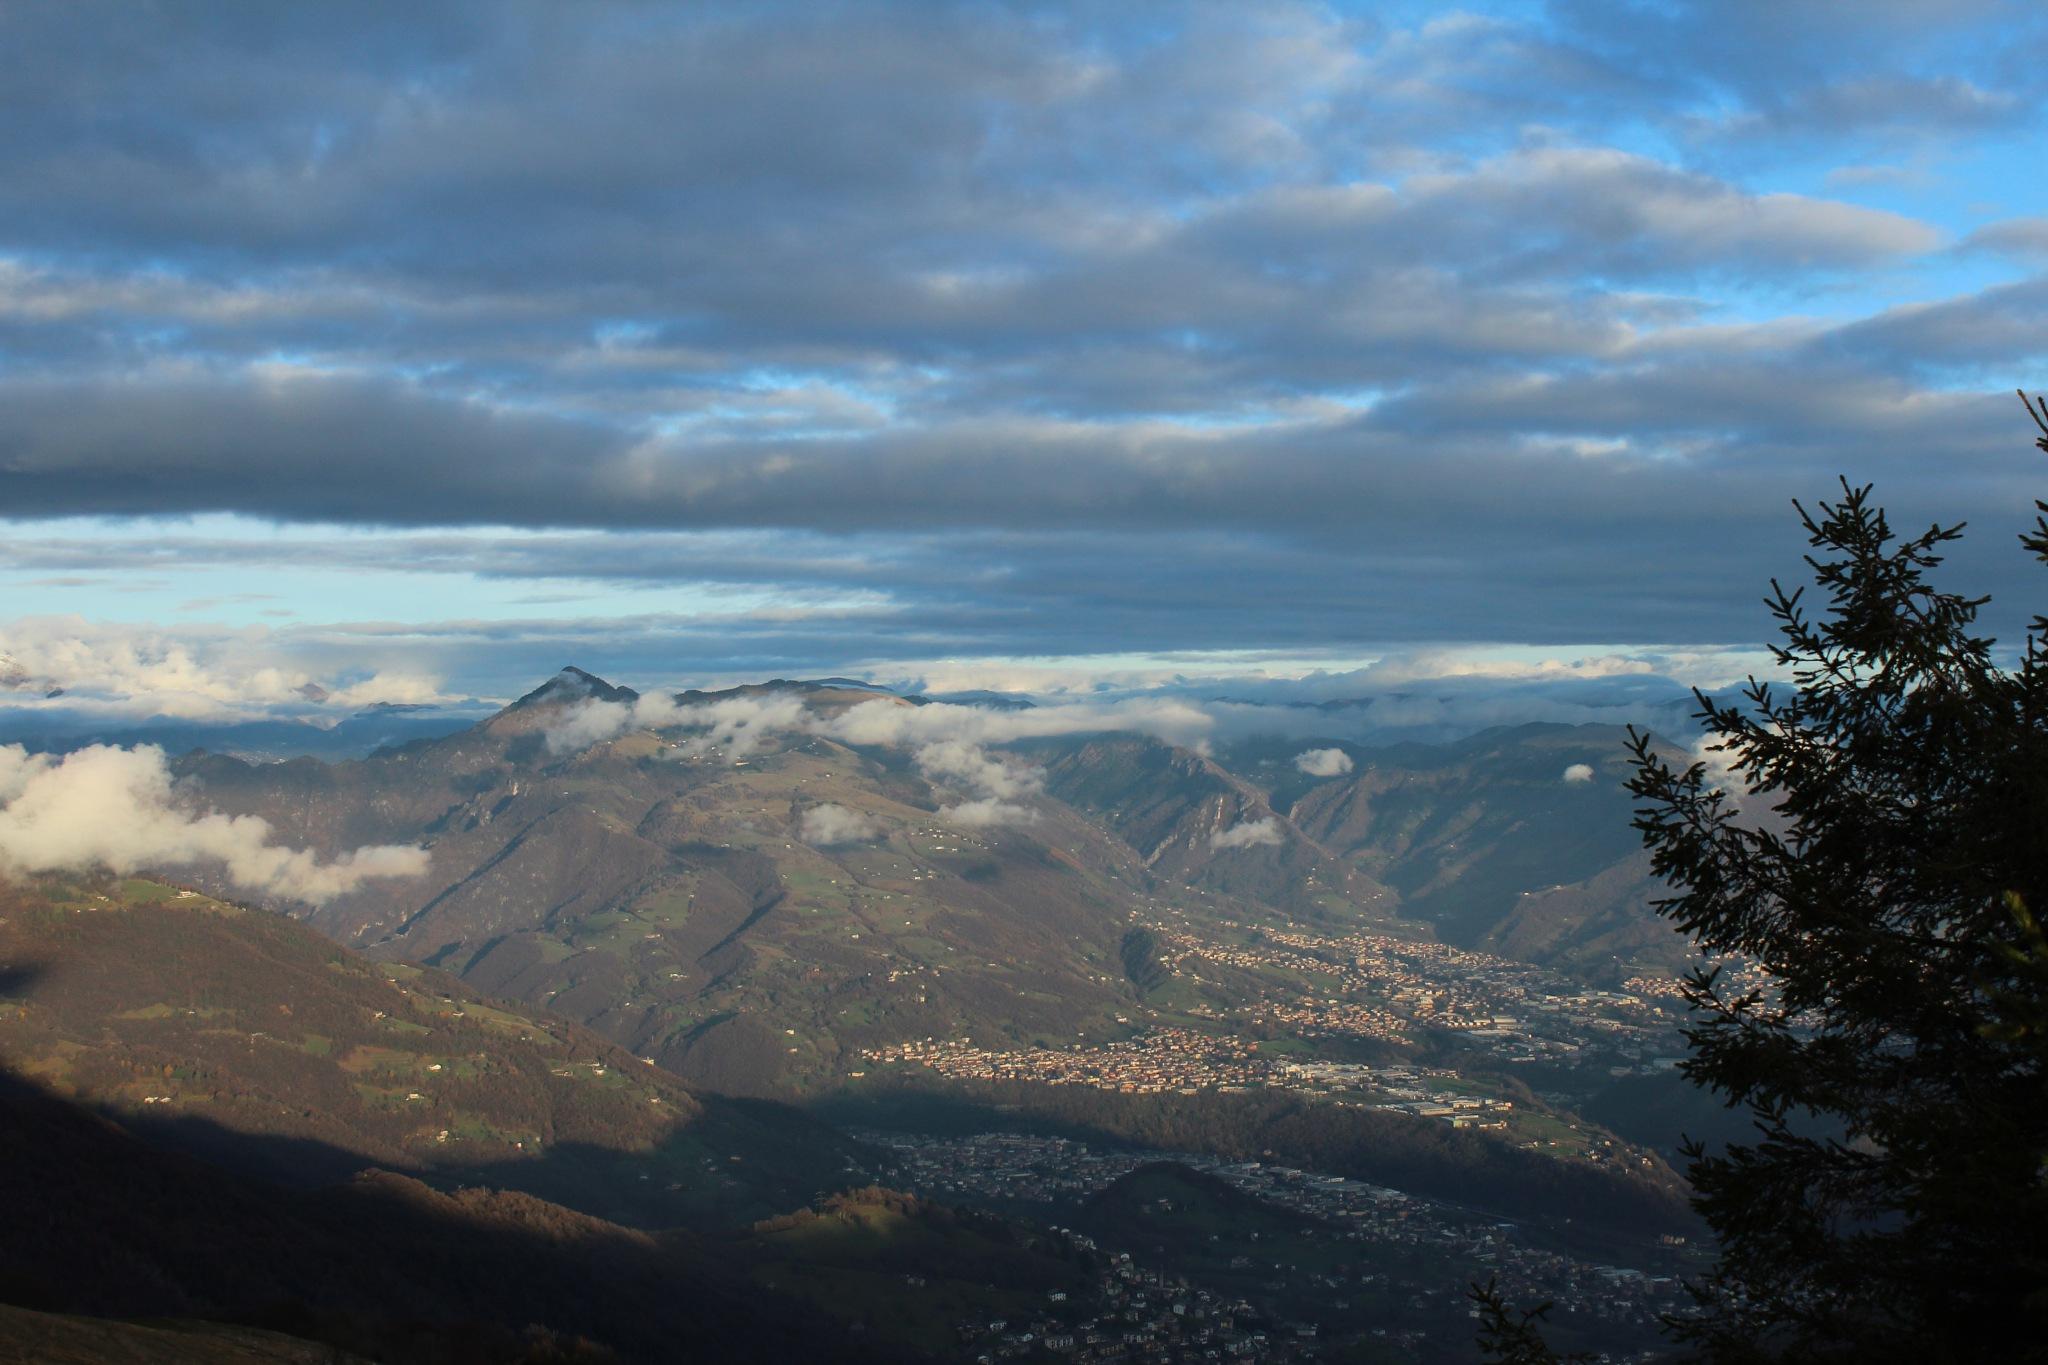 Dal monte Poieto BG by saraorler